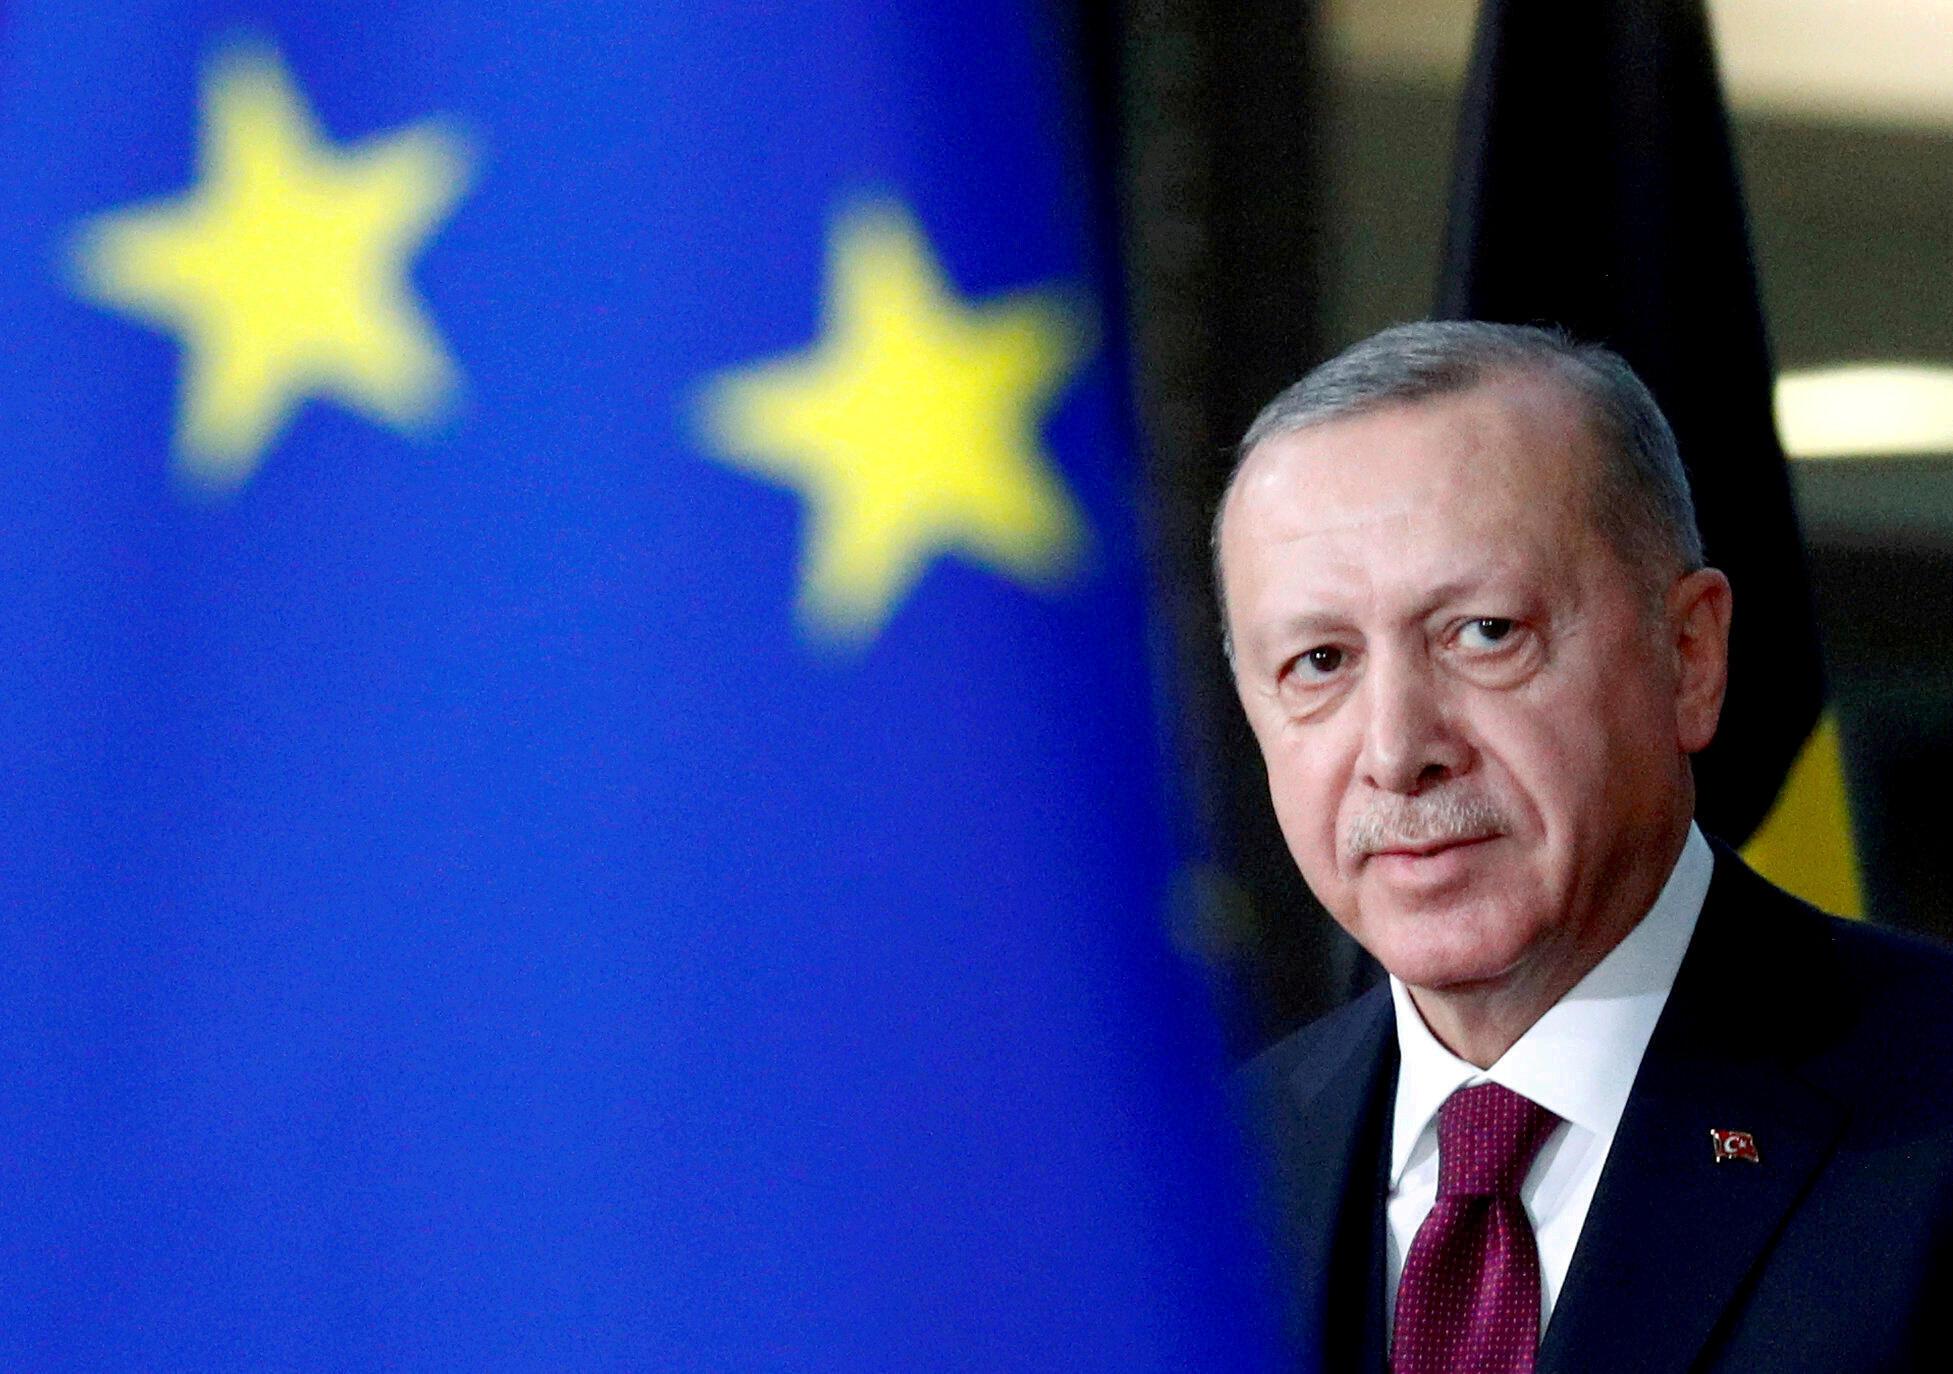 2021-03-01T183203Z_43645833_RC2I2M94S08M_RTRMADP_3_USA-TURKEY-CONGRESS